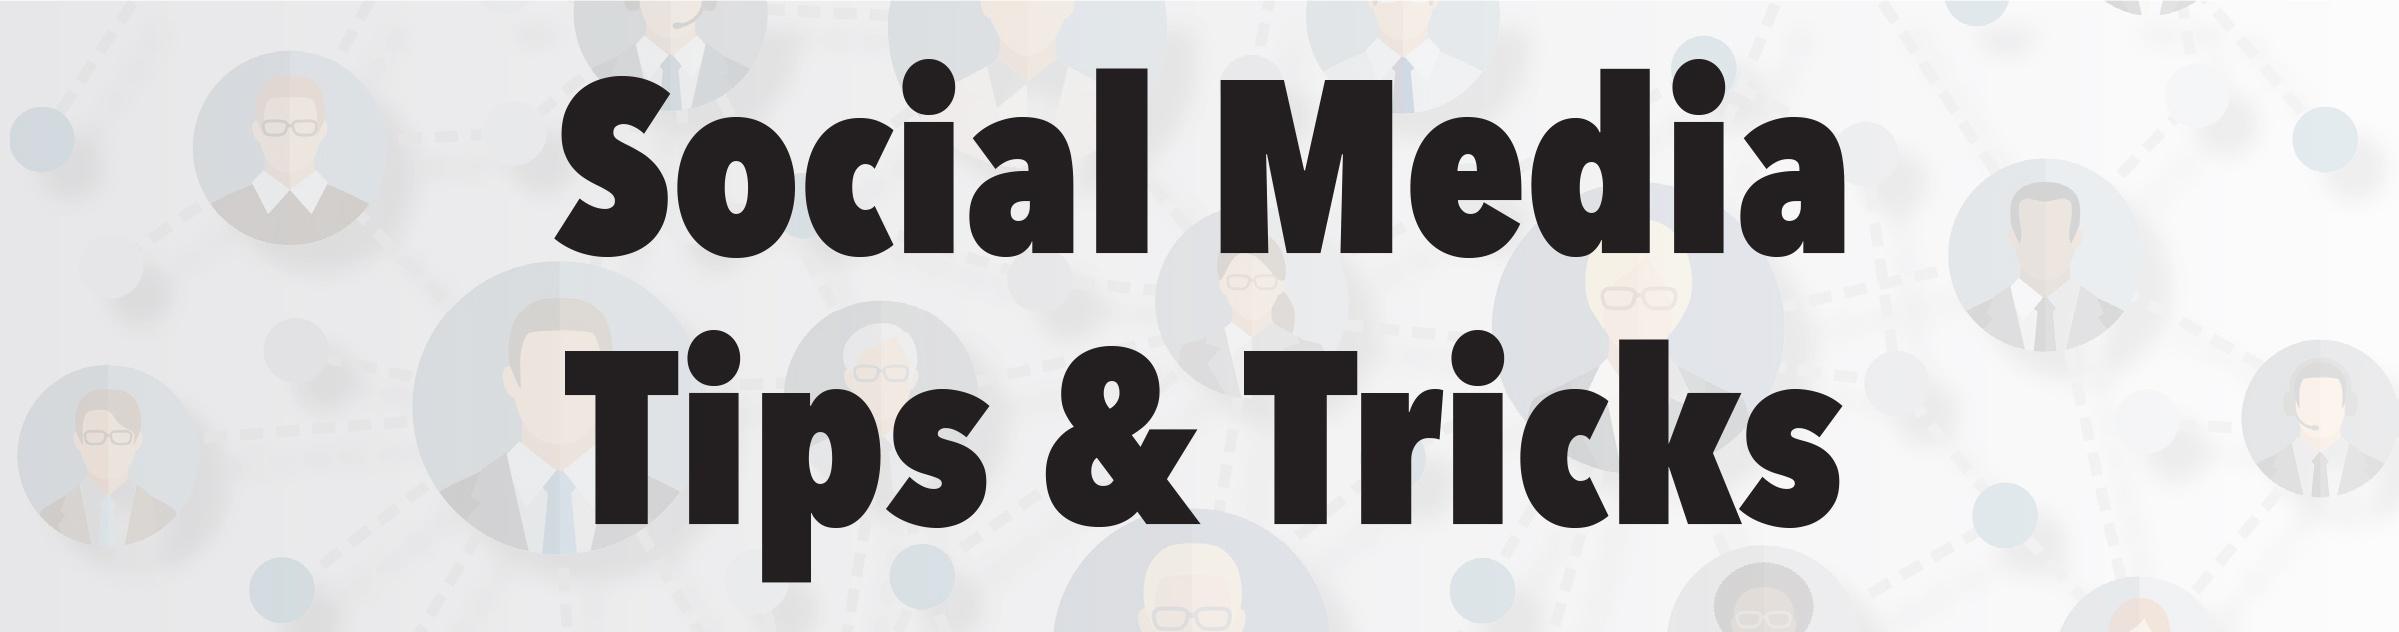 social media tips and tricks jjc joliet junior college